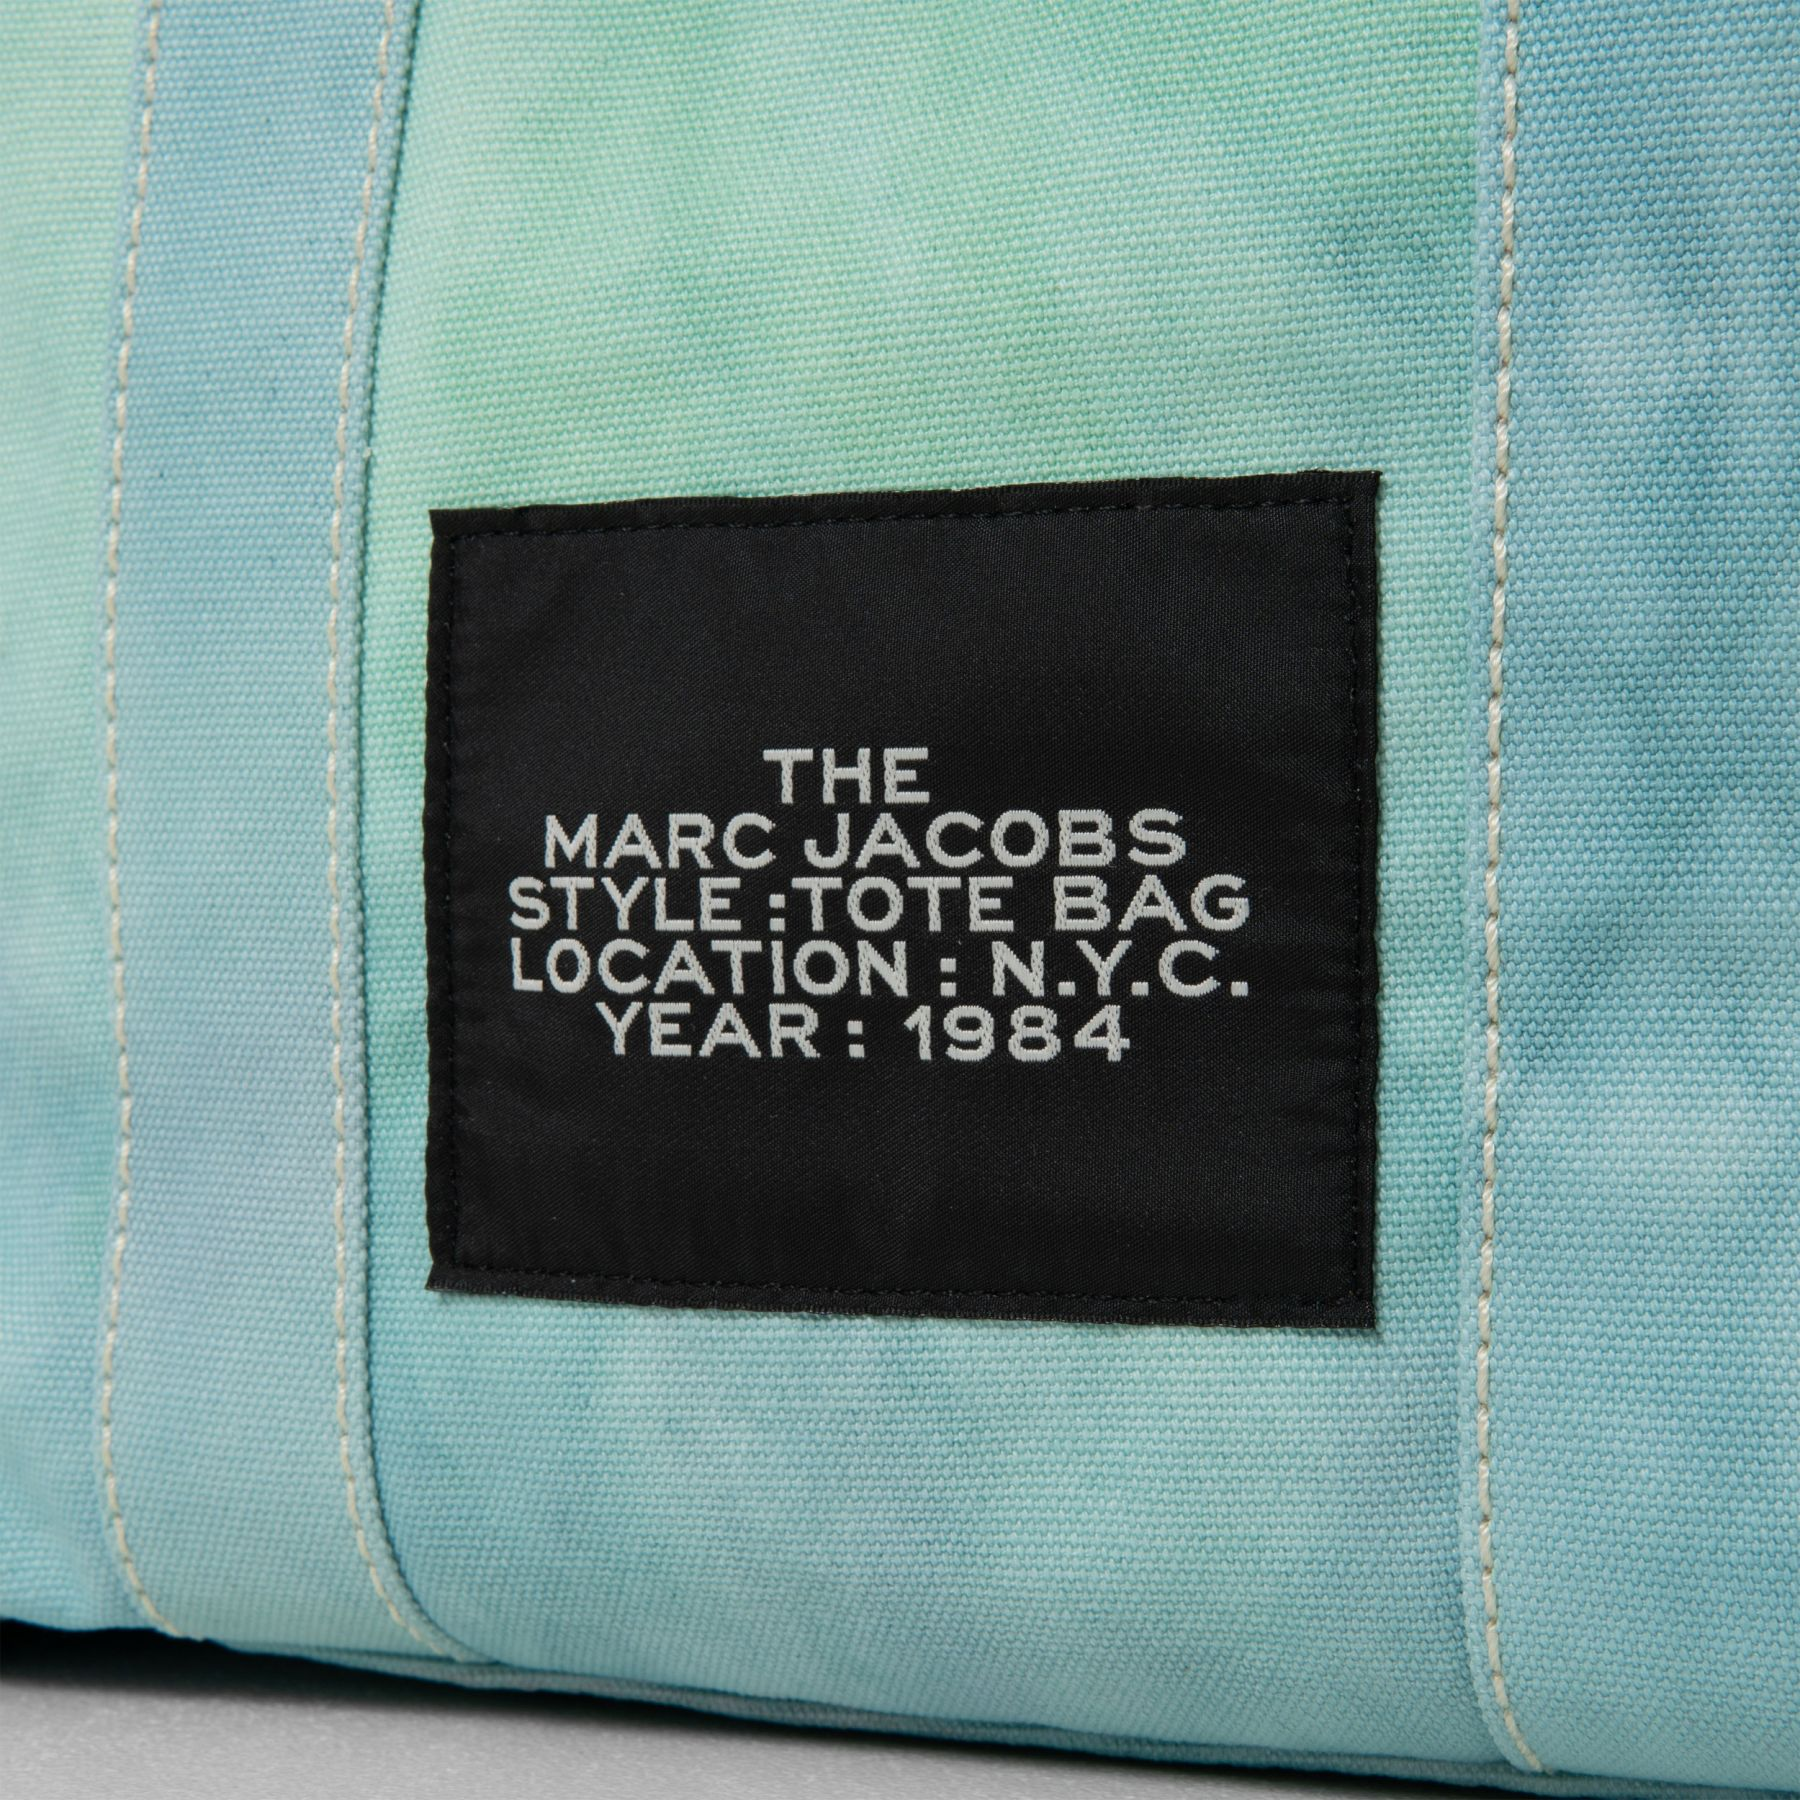 Сумка Marc Jacobs THE TIE DYE TOTE BAG голубая